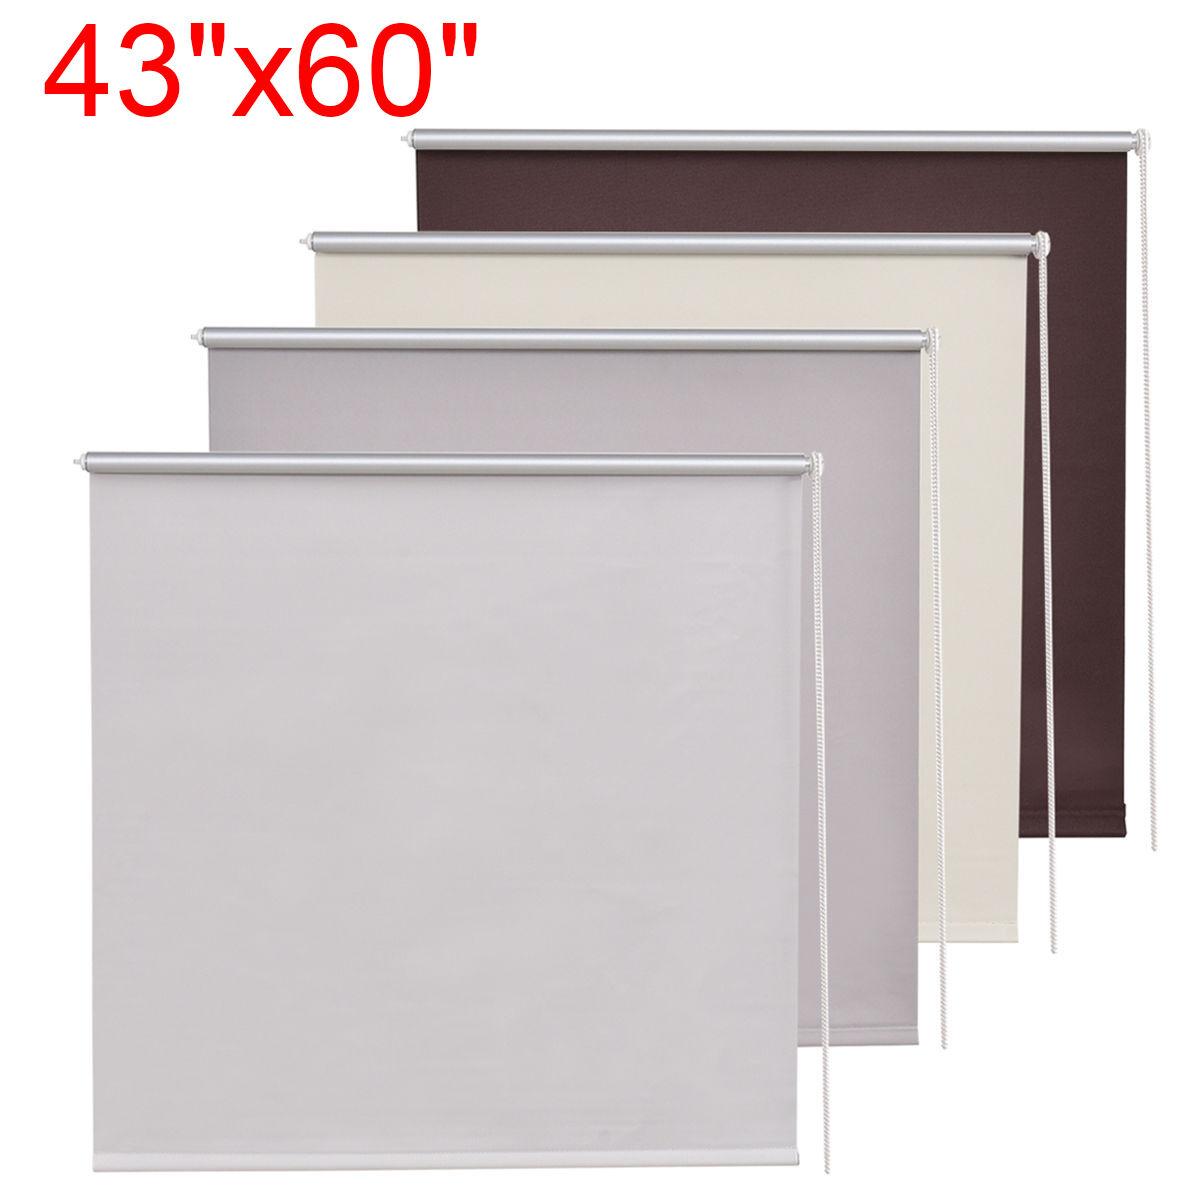 "43""x60"" Roller Full Blinds Sunscreen Blackout Sun Shade Curtain Window 4 Colors"